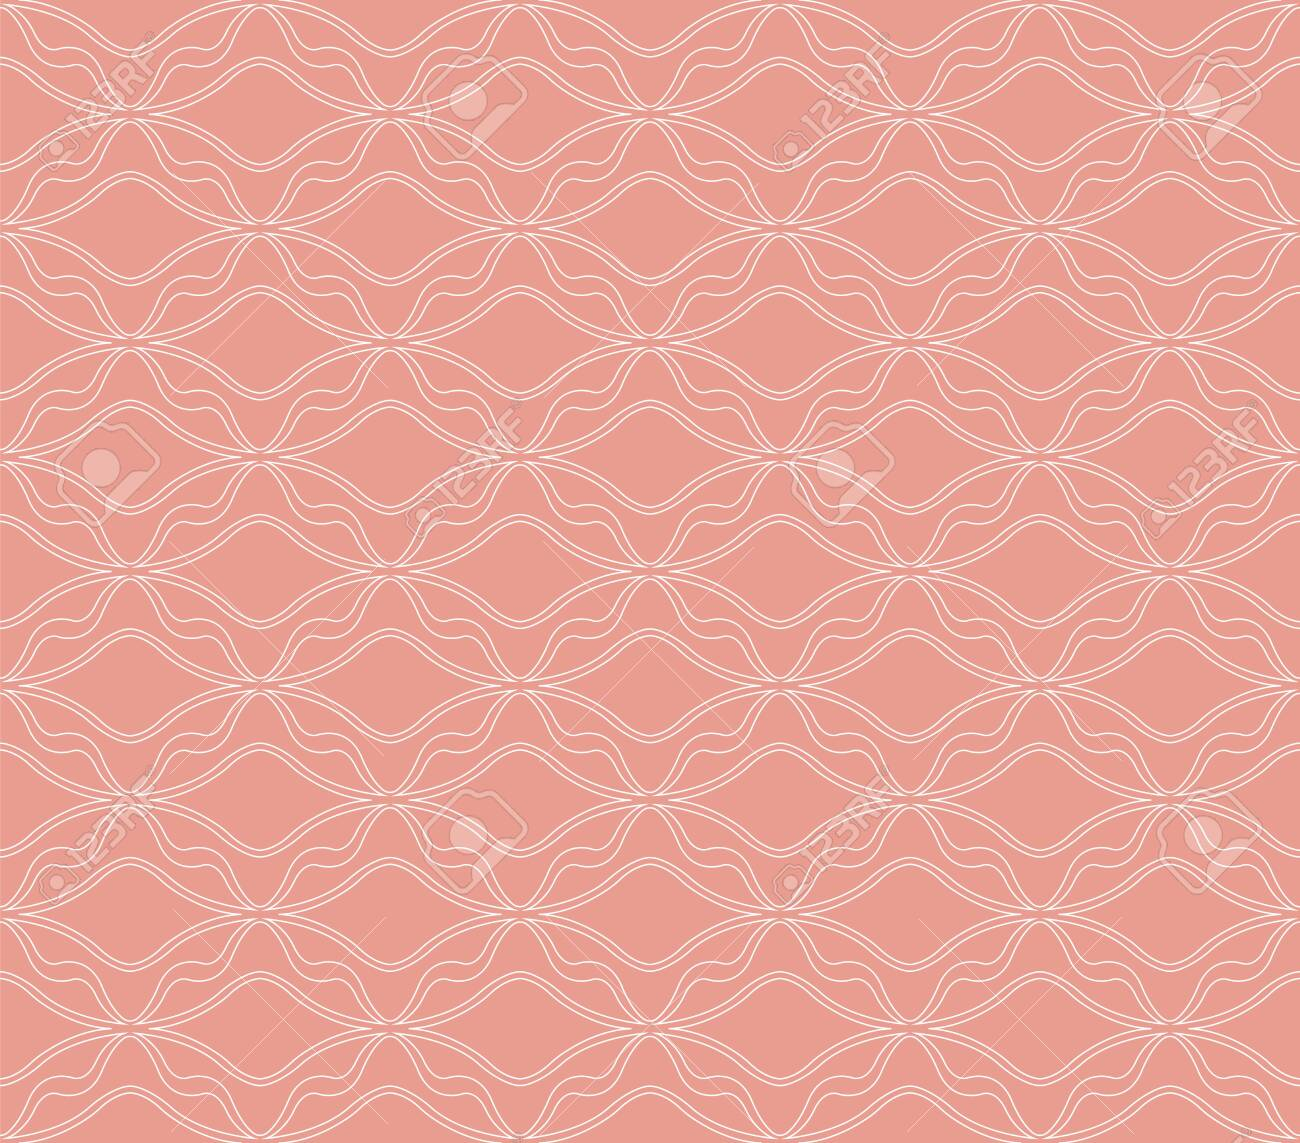 Classic Art Deco Seamless Pattern. Geometric Stylish Texture. Abstract Retro Vector Texture. - 129899457